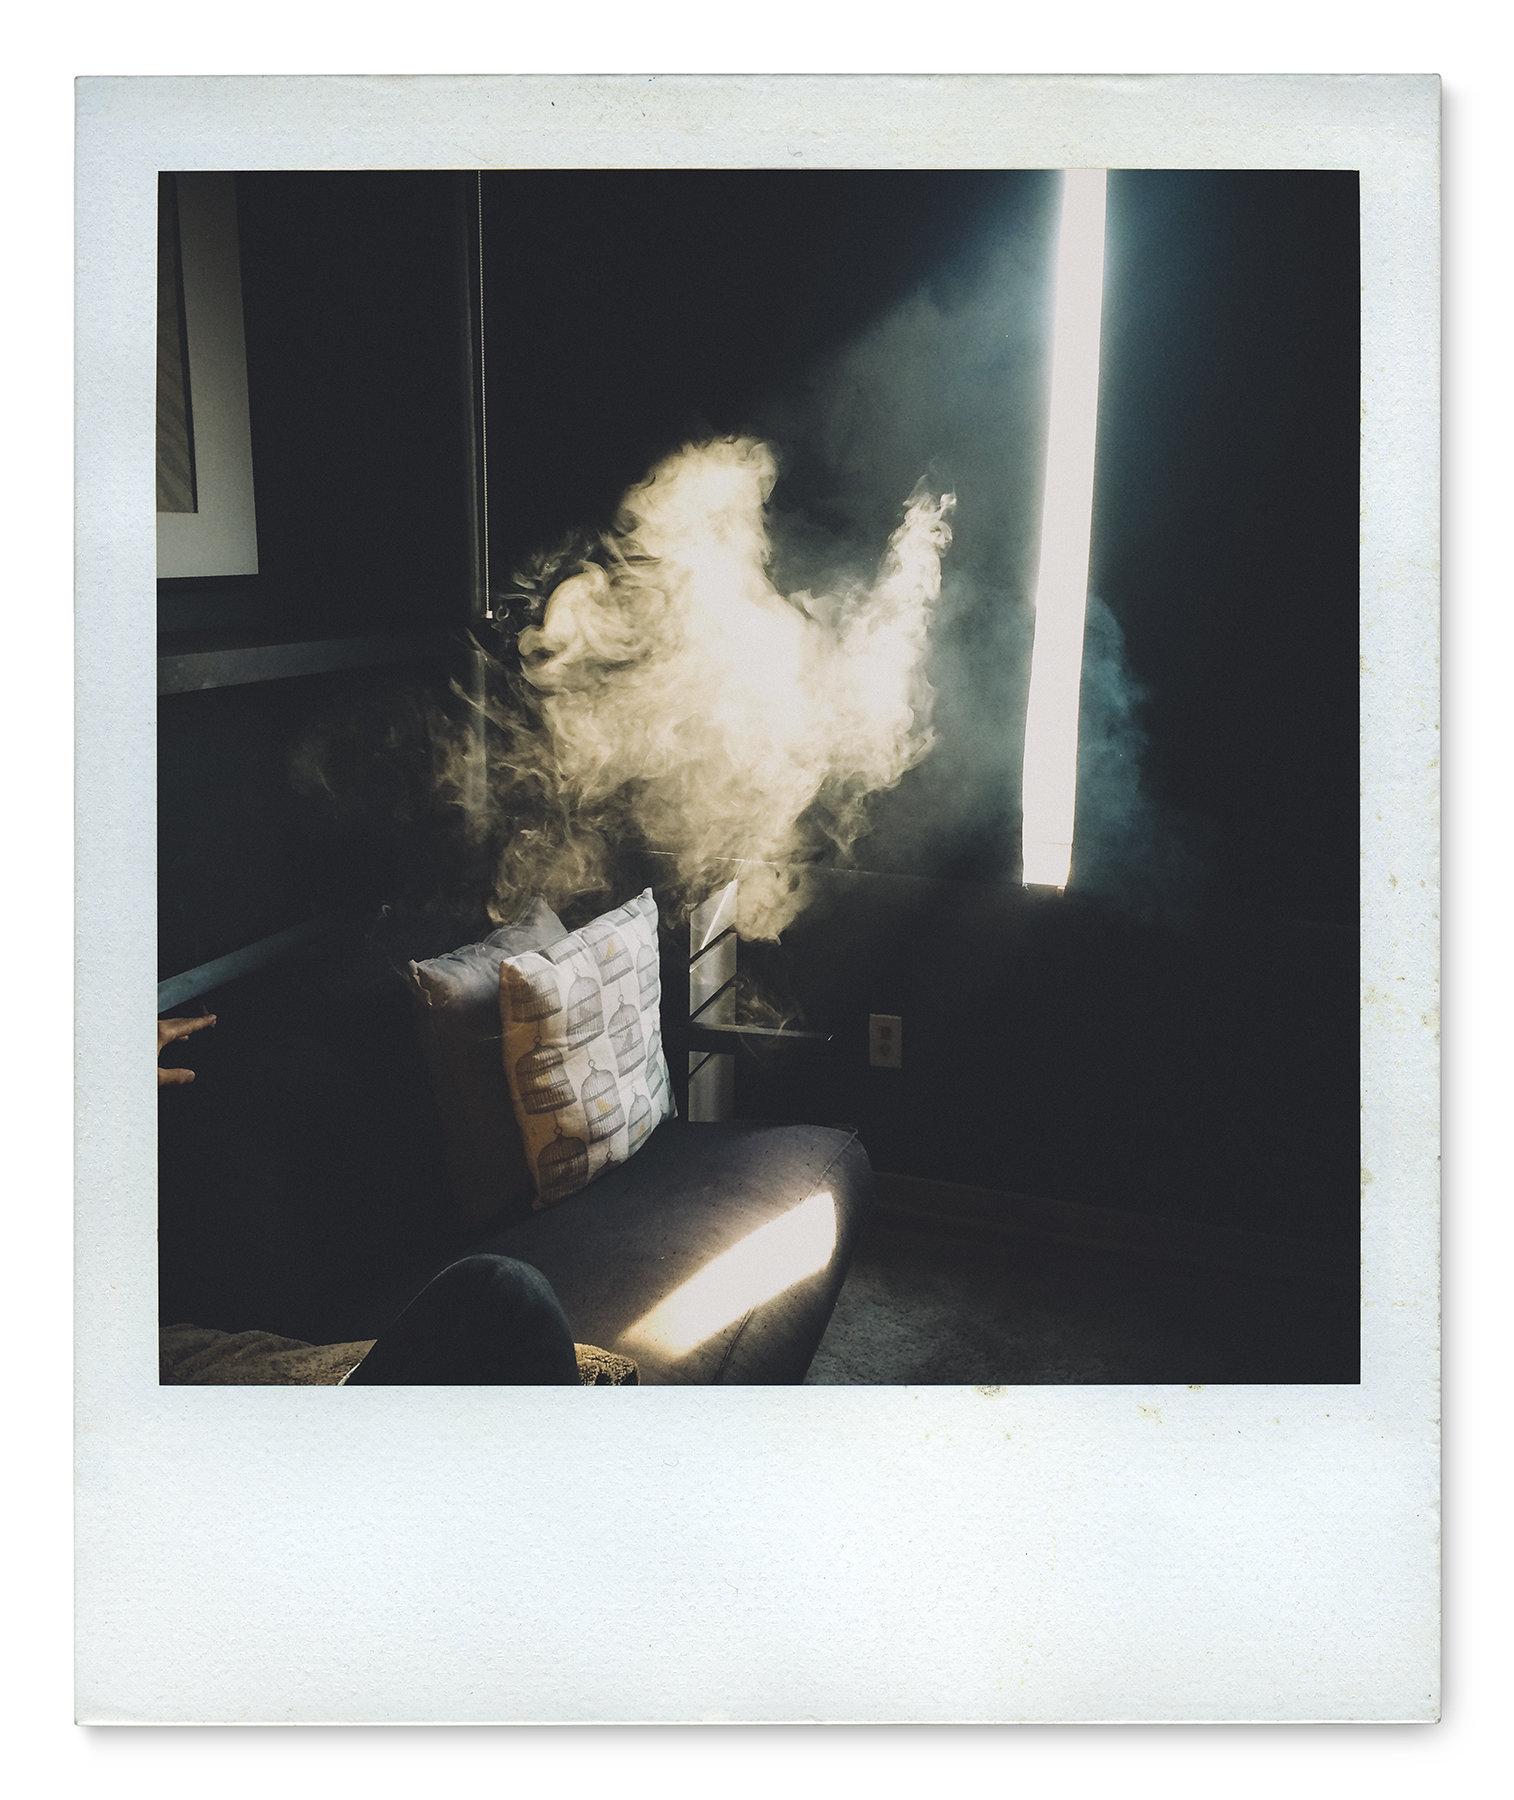 053_Polaroid SX70_IMG_2169.jpg